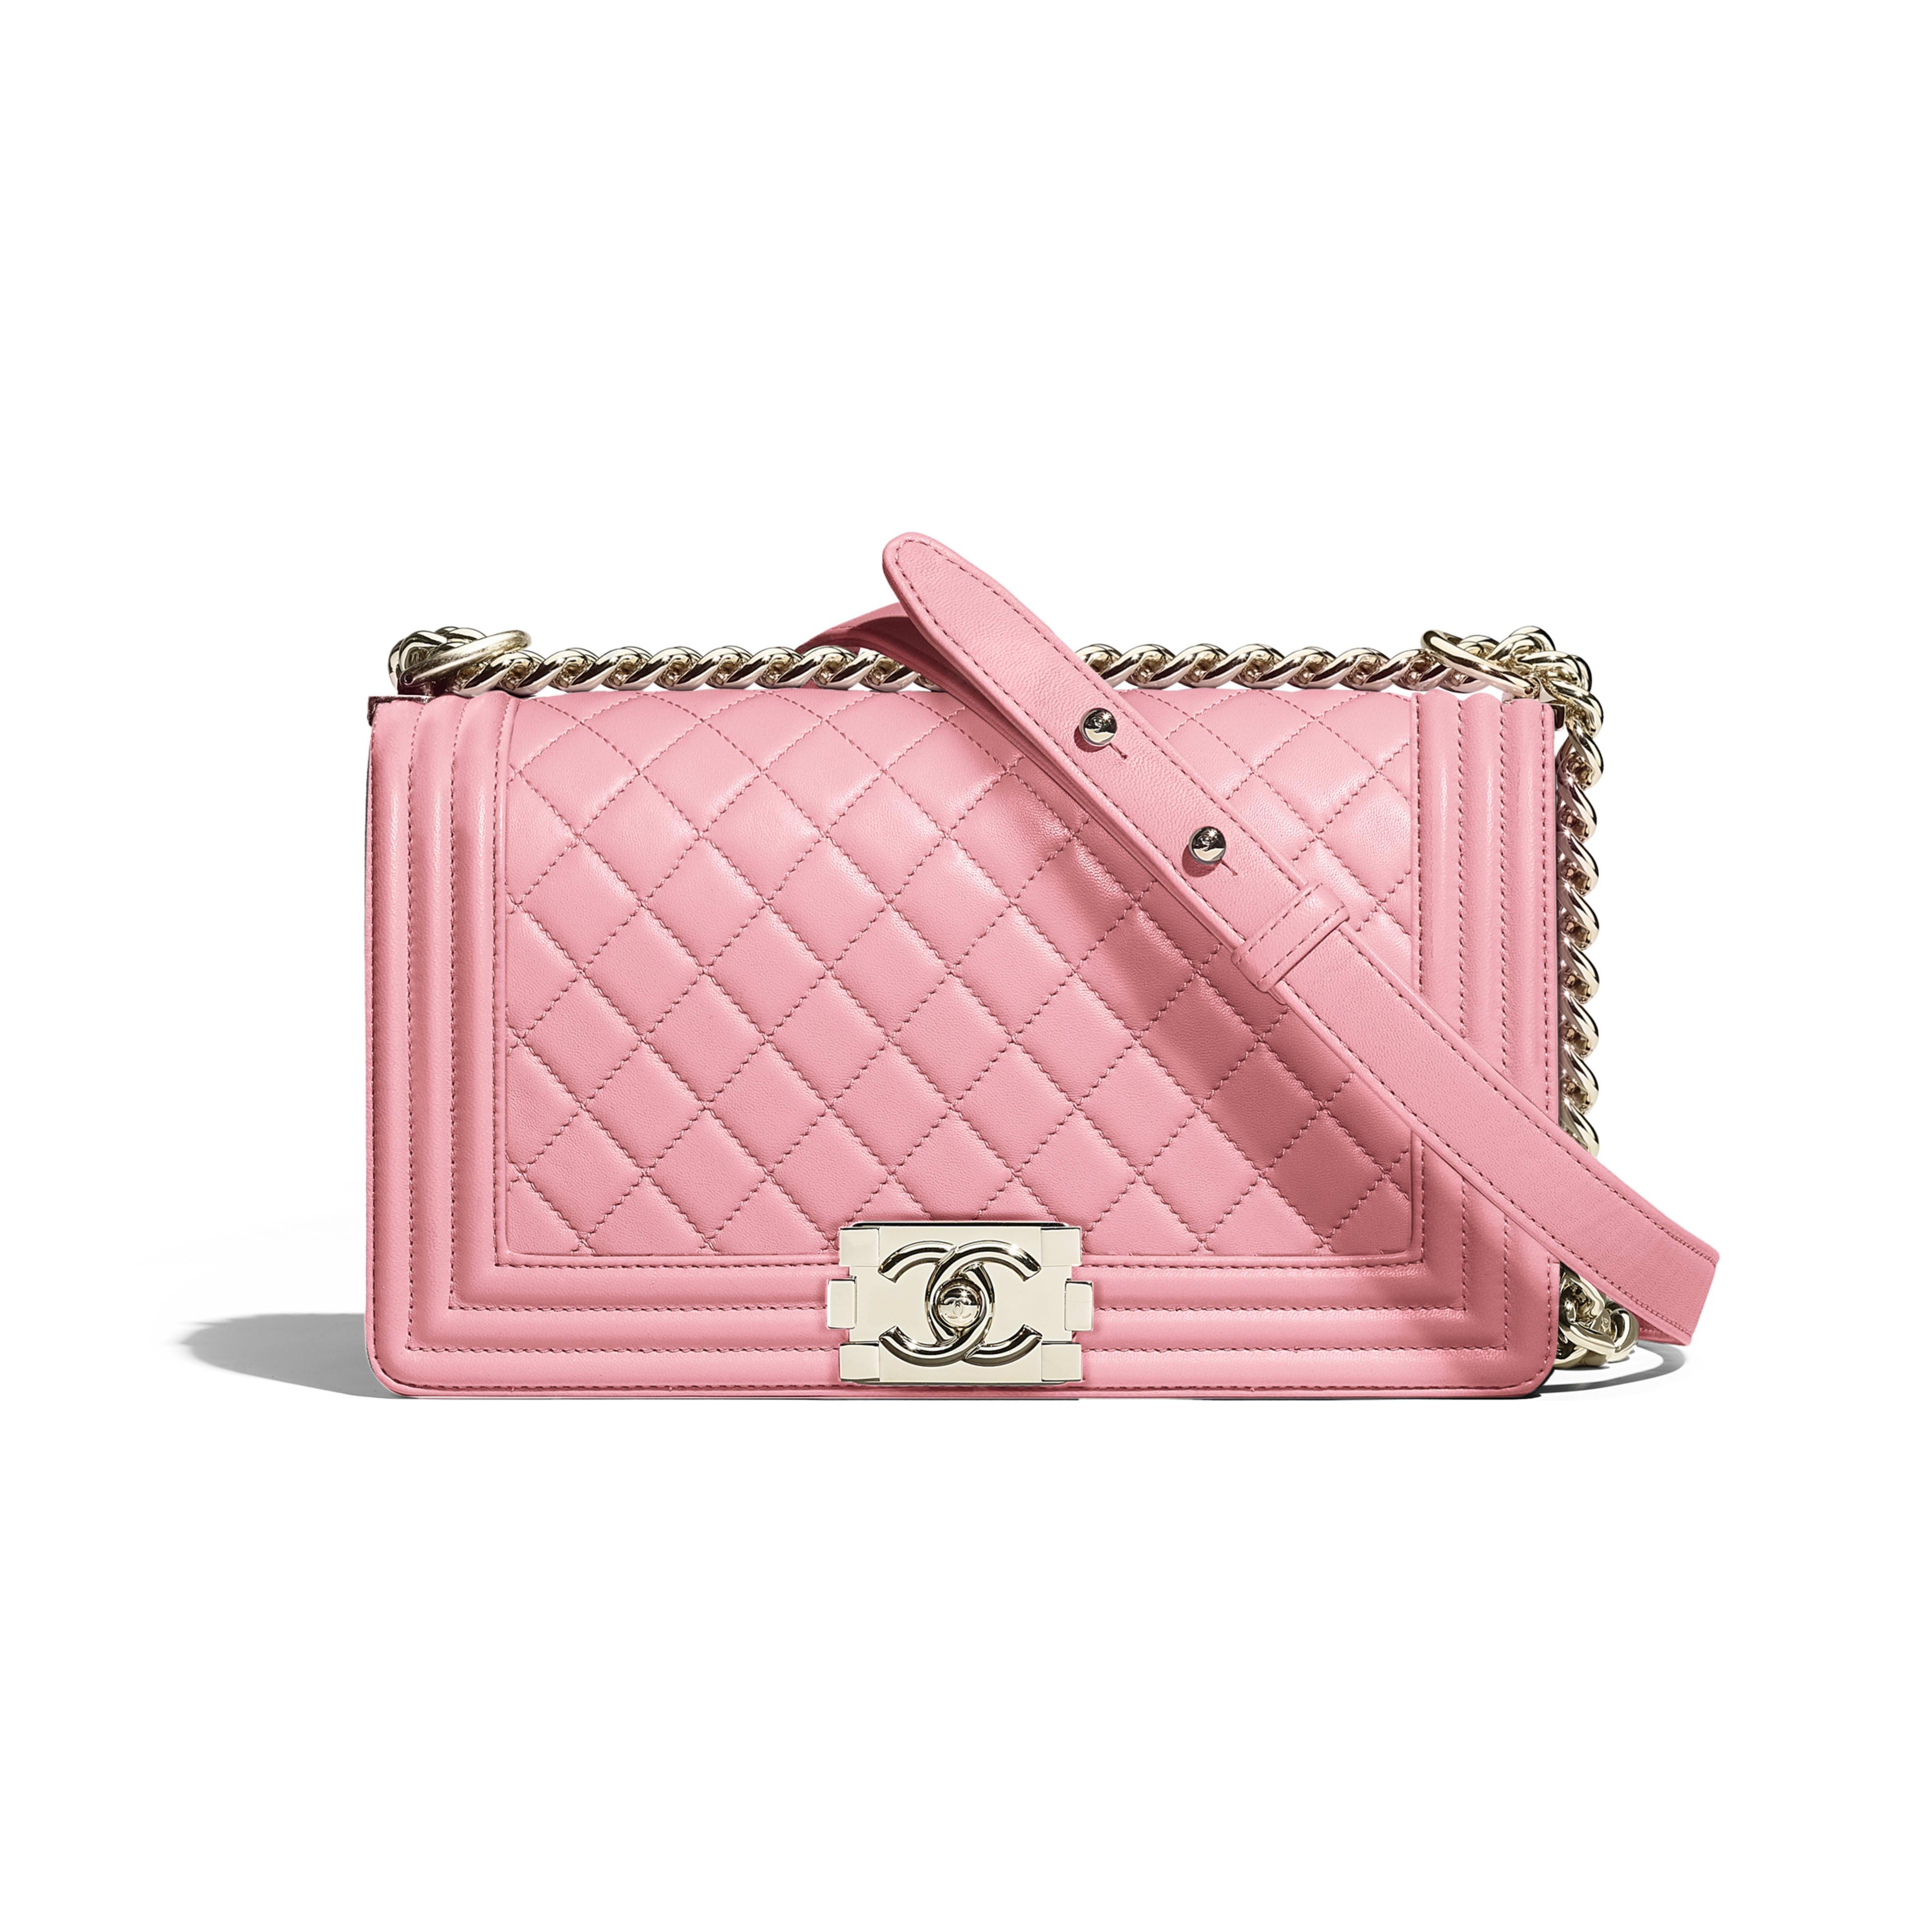 Calfskin & Gold-Tone Metal Pink BOY CHANEL Handbag   CHANEL